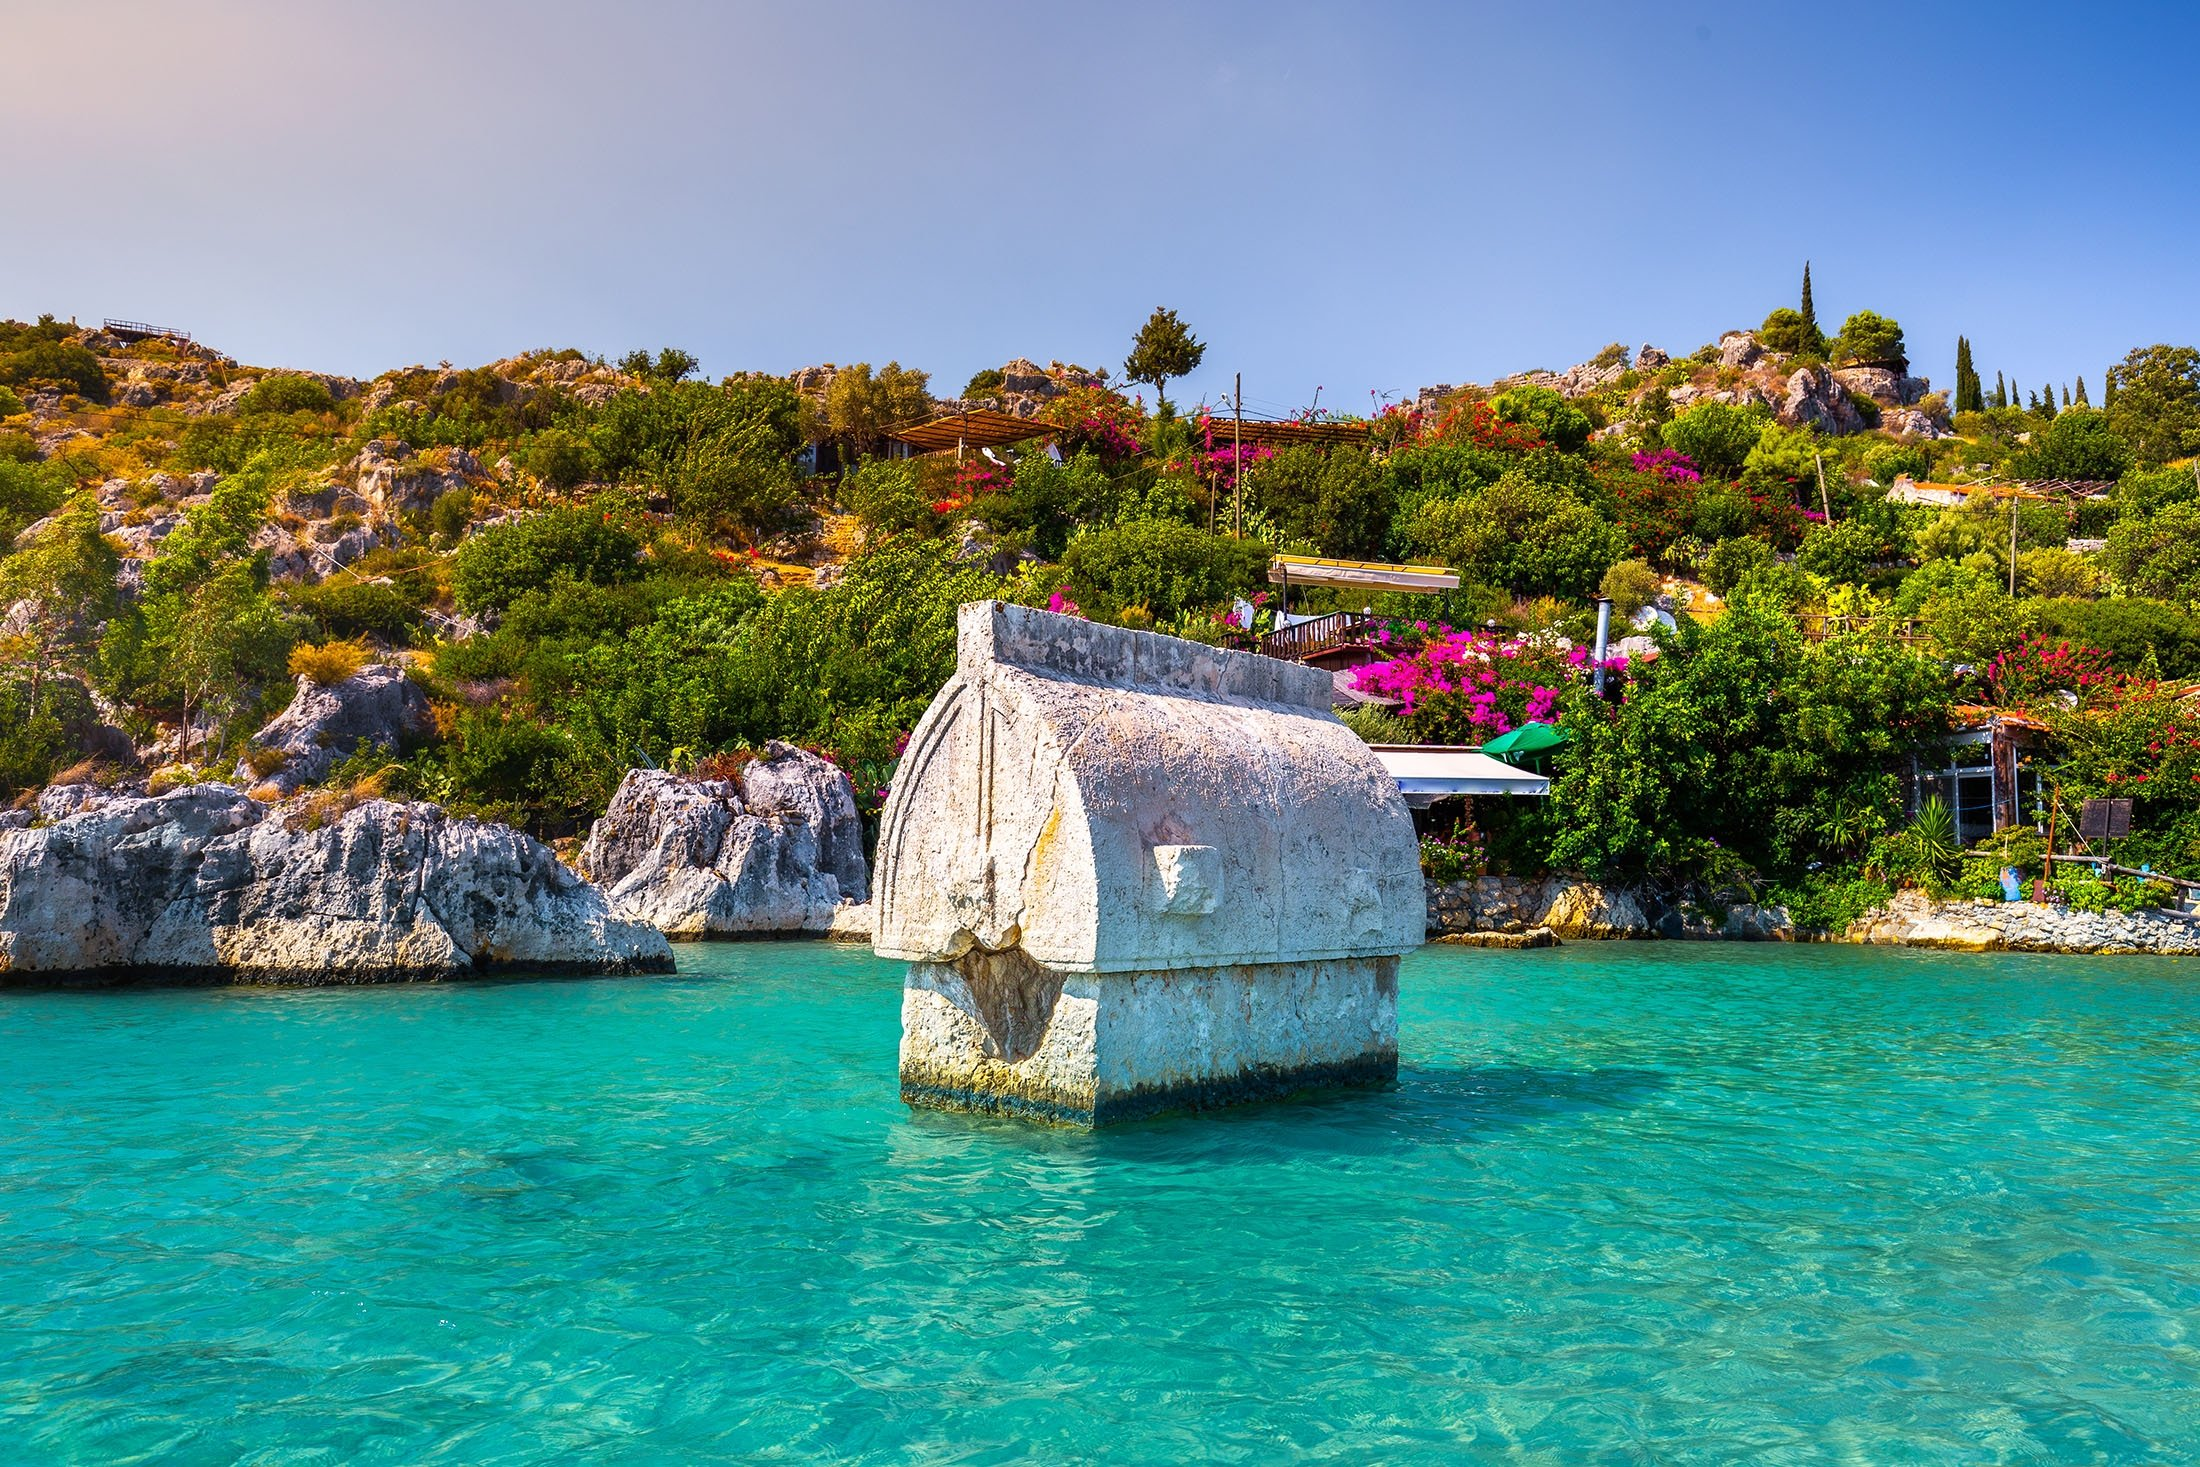 Kekova Island. (Shutterstock Photo)